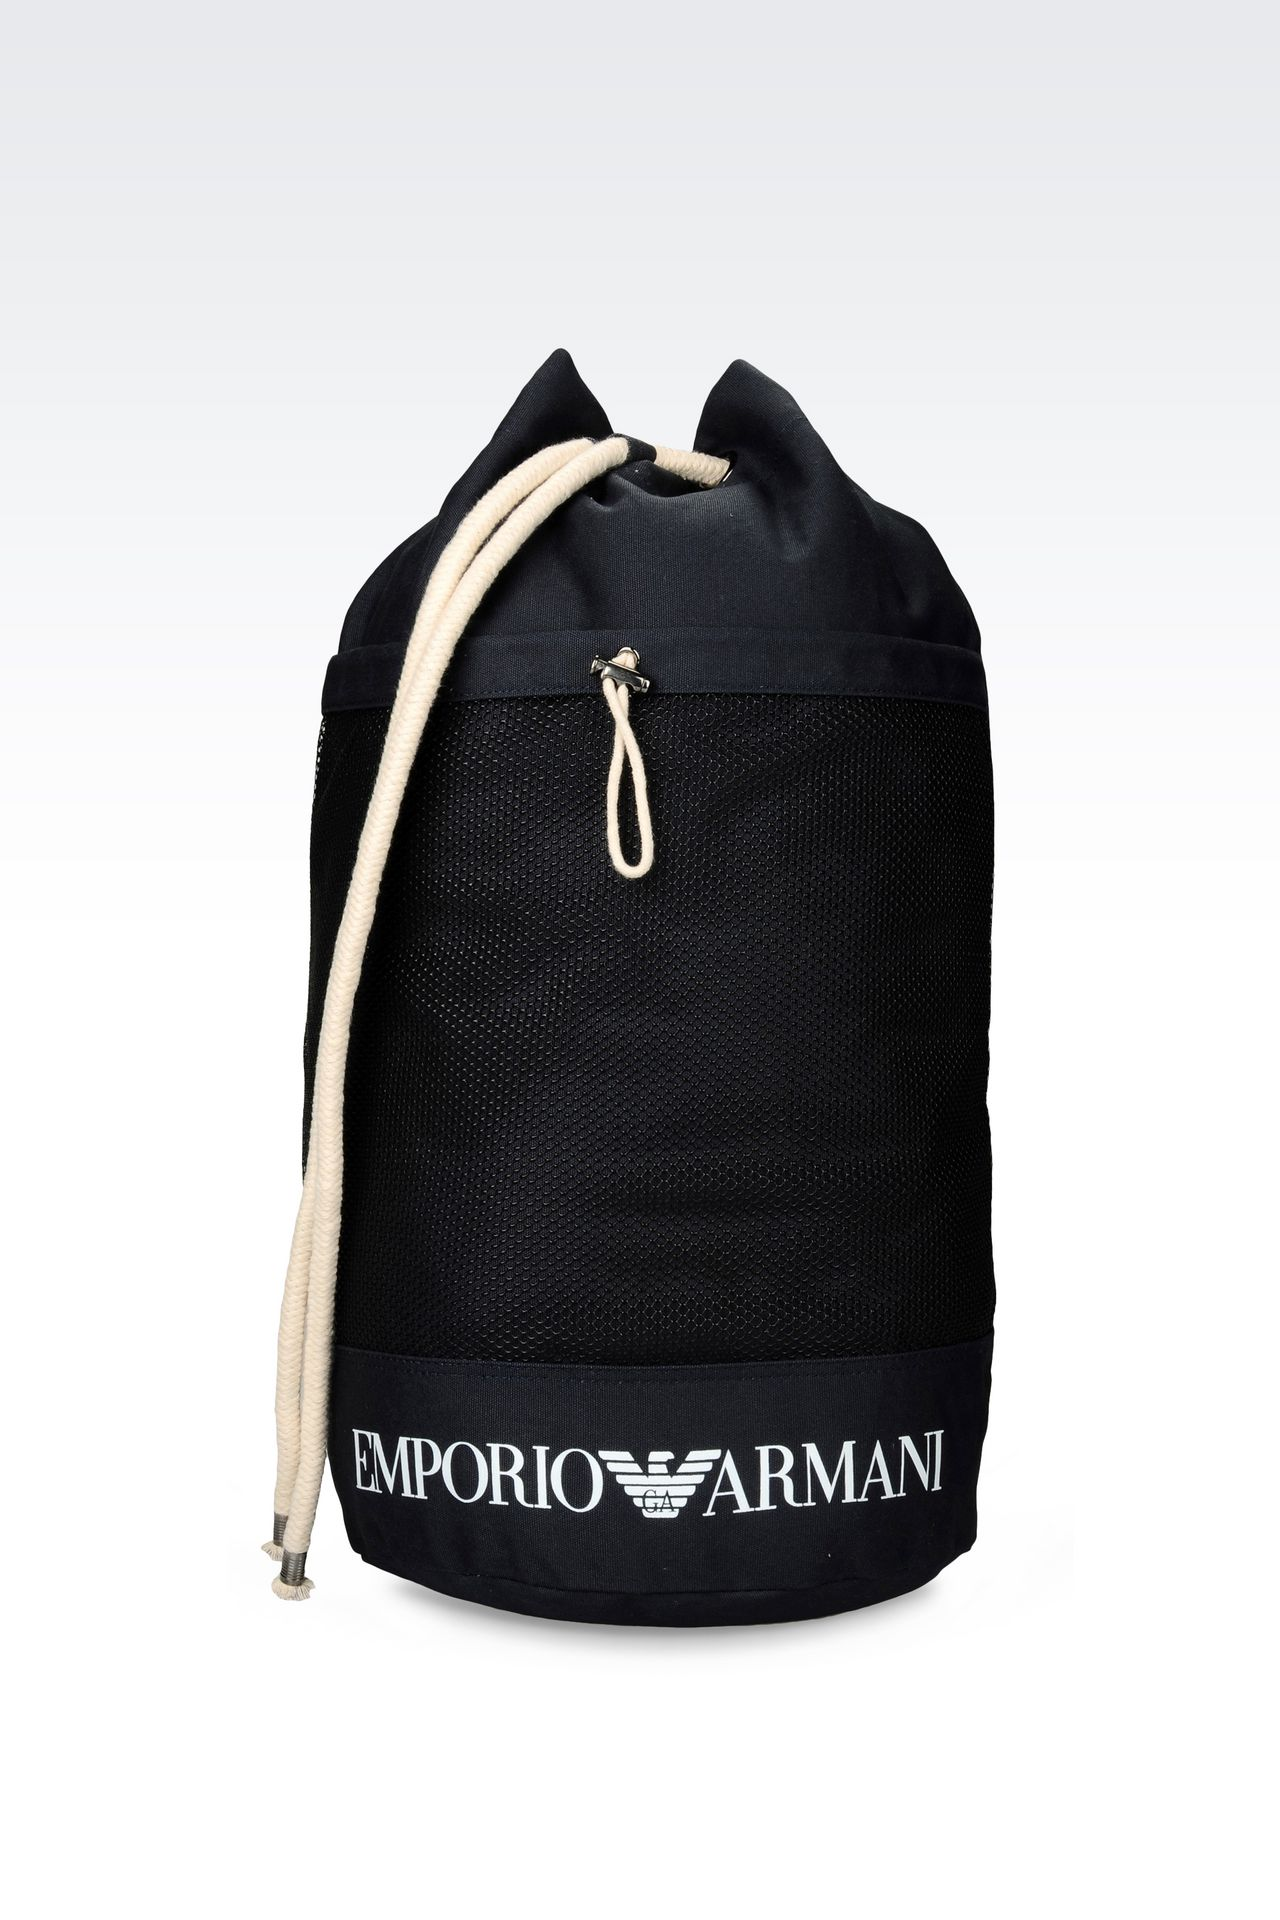 Emporio Armani Men, - Armani.com